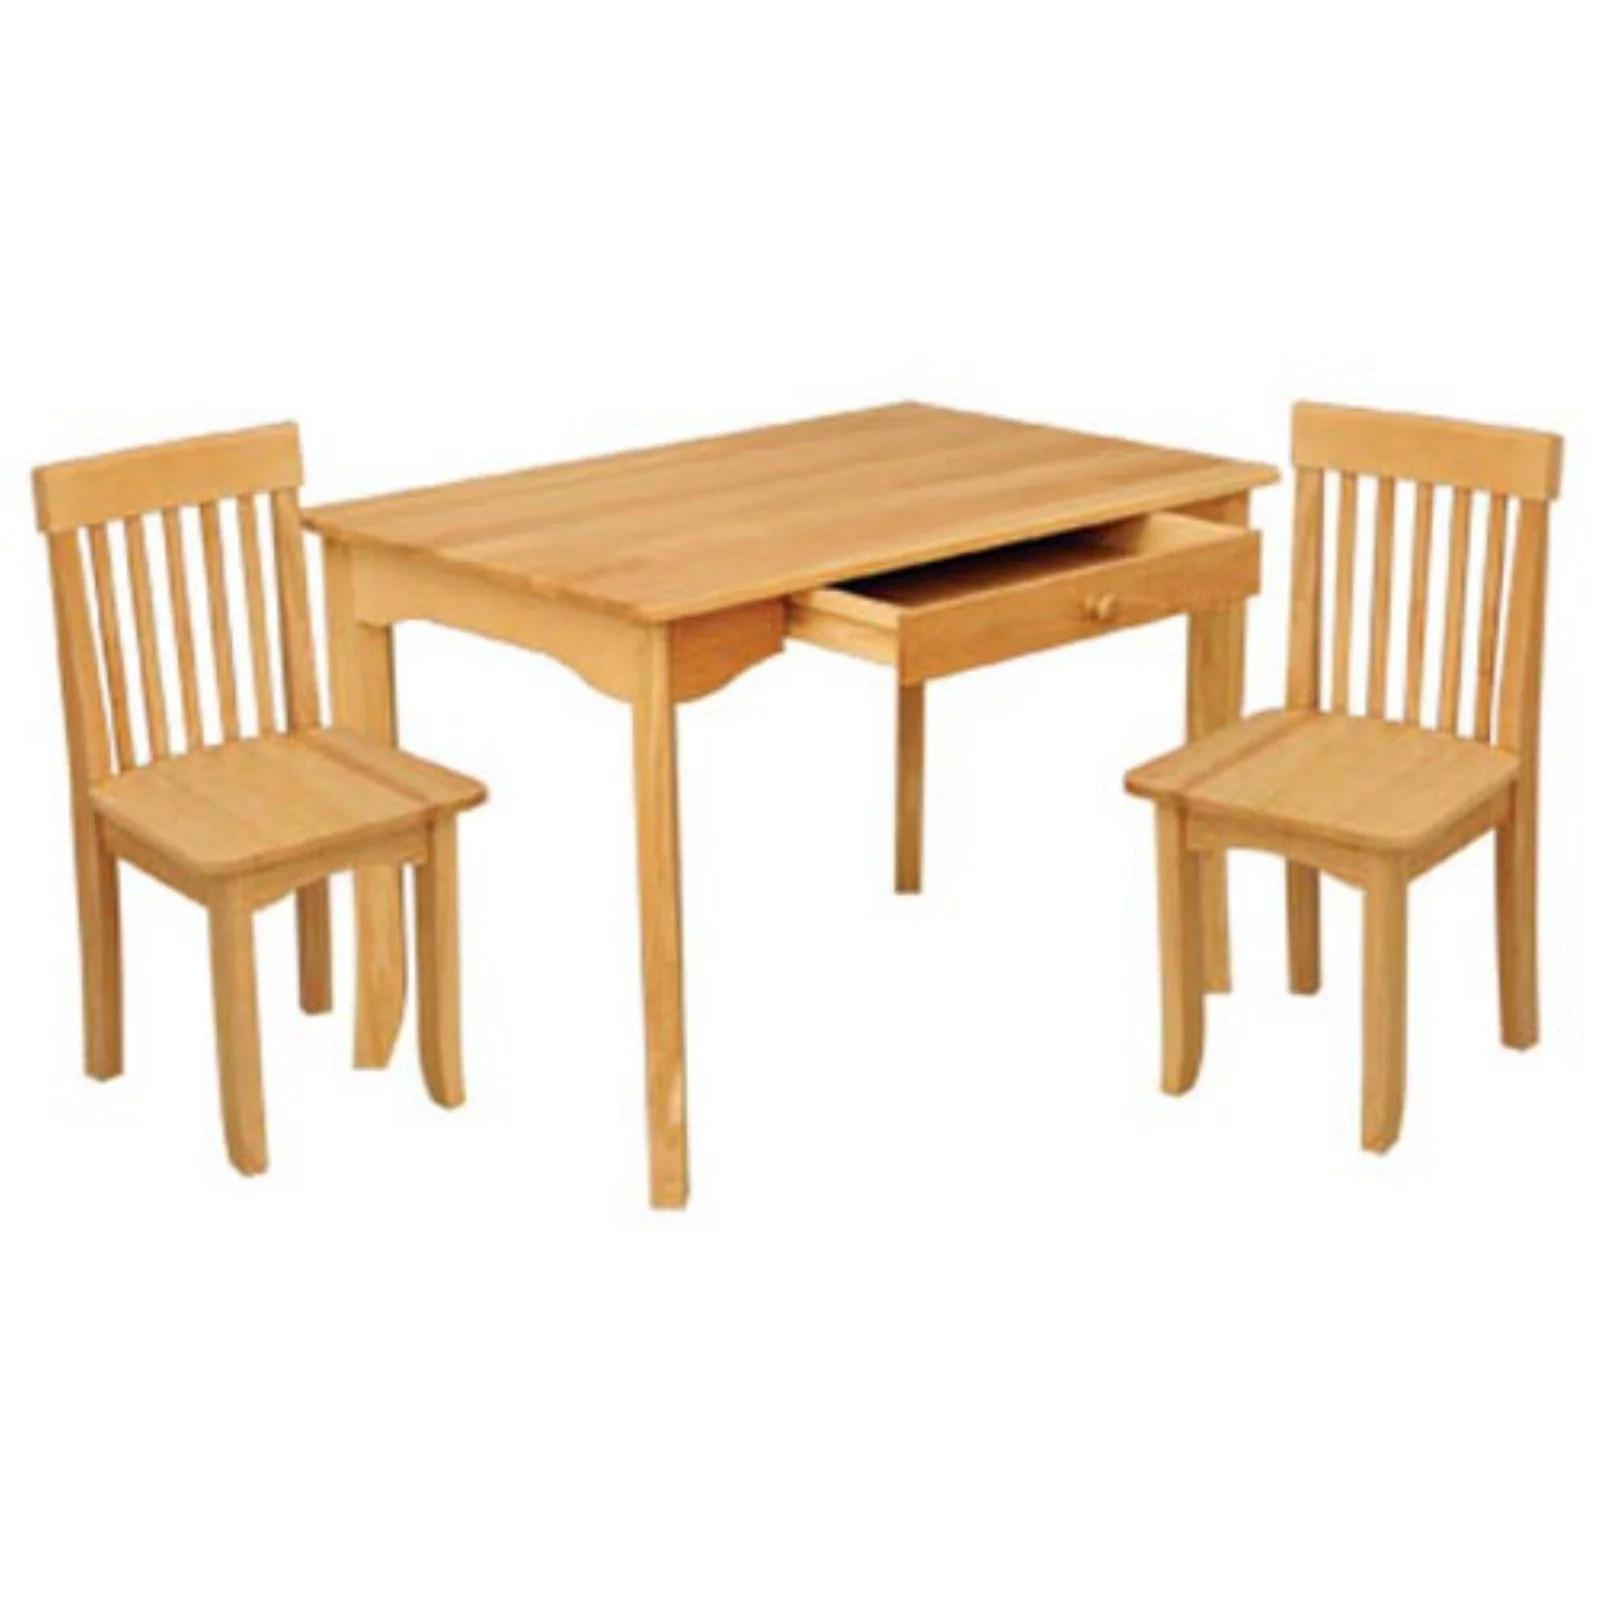 kidkraft avalon chair most comfortable outdoor imaginarium table and 2 set